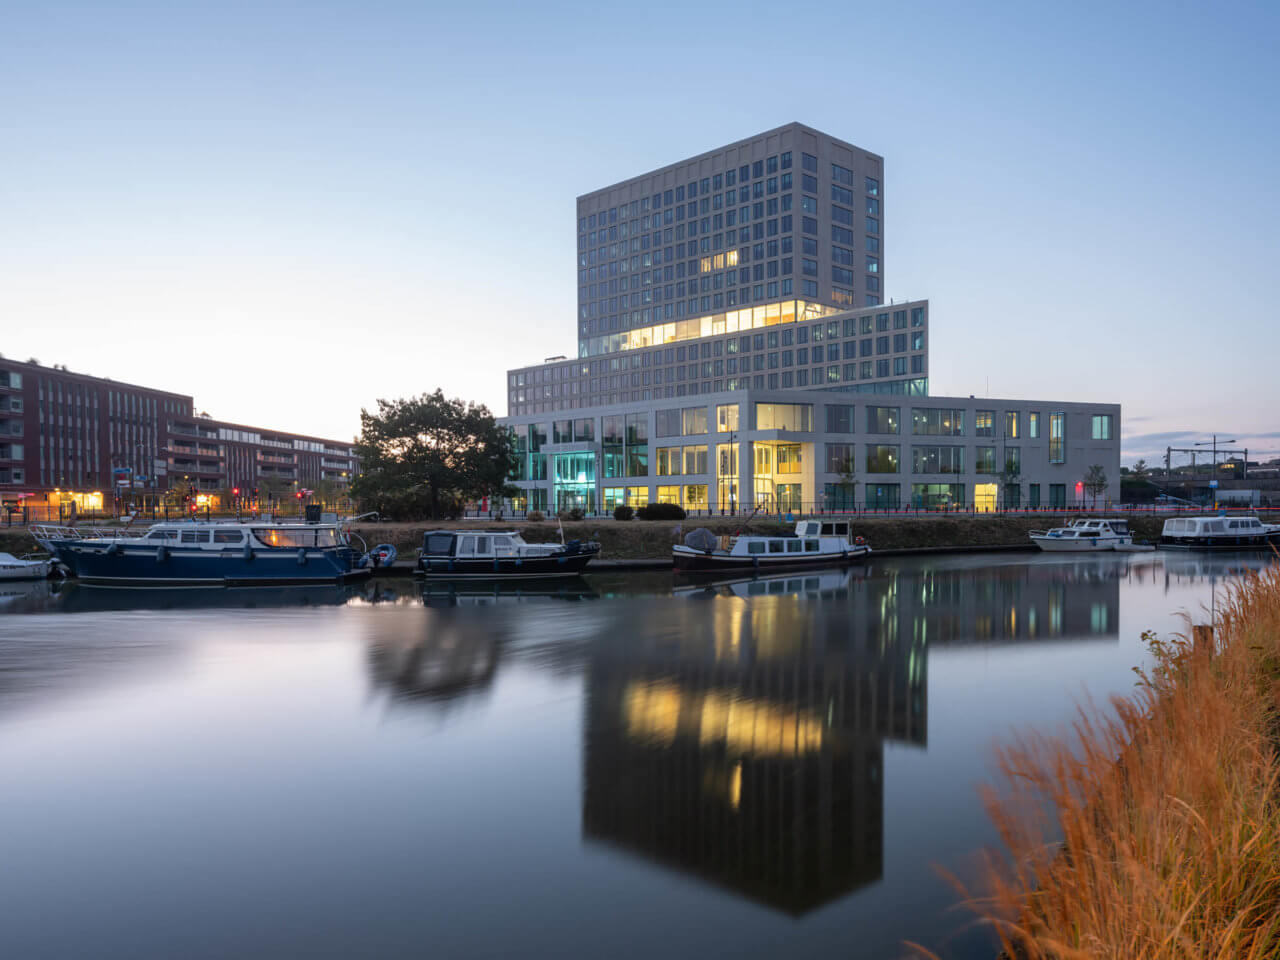 37_Rechtbank_Breda_∏Ossip